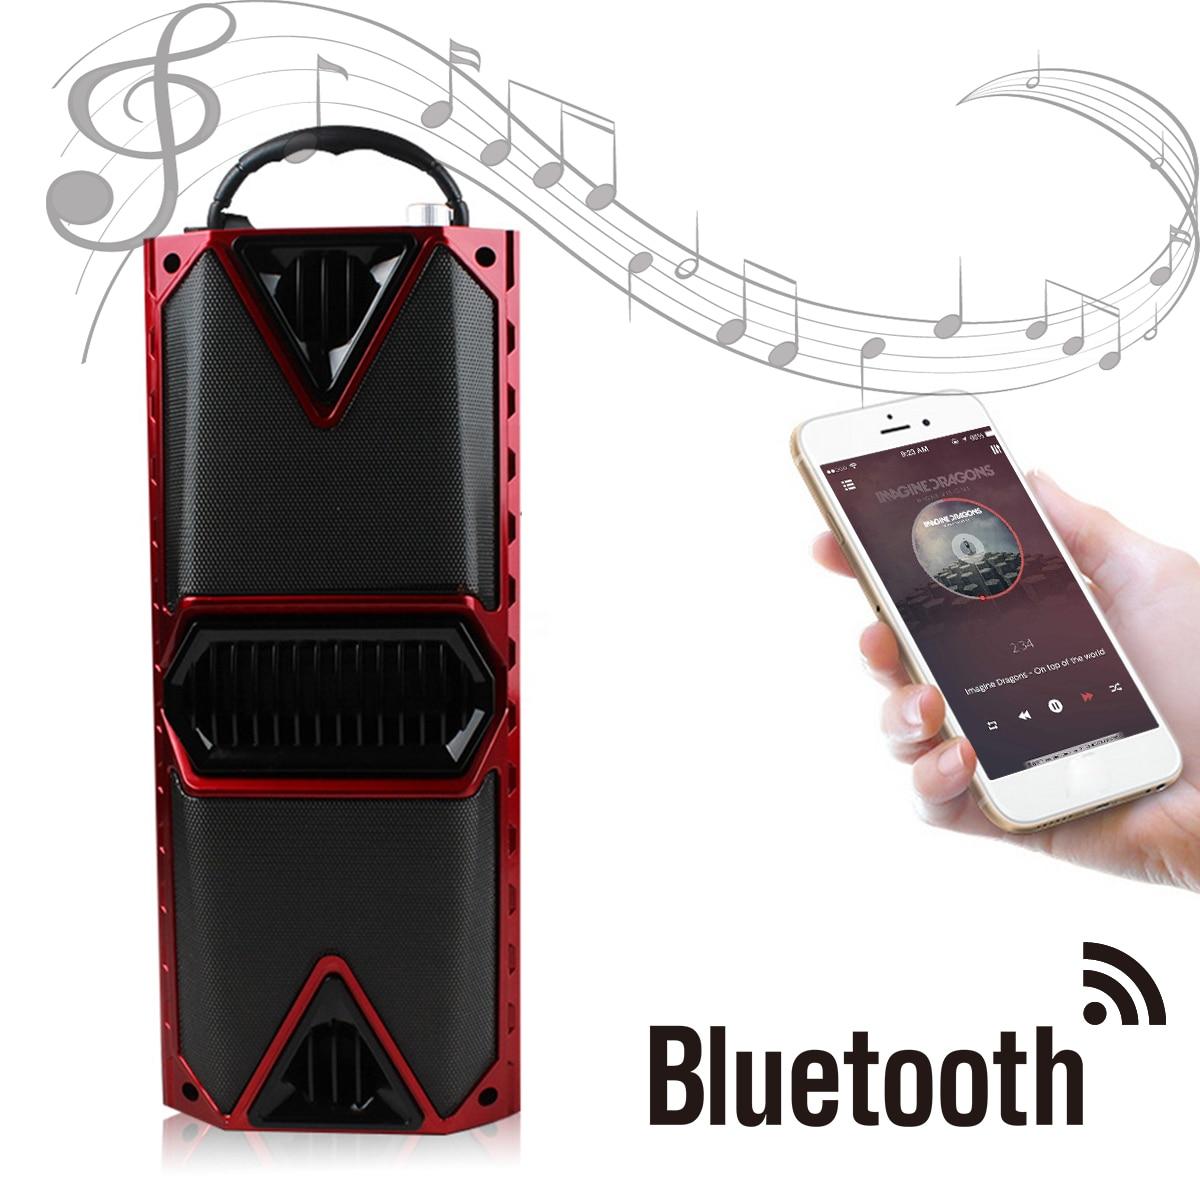 Music Player Portable Wireless LED Display Bluetooth Speaker Stereo FM Radio Karaoke Handsfree Hi-Fi USB AUX TF Mic Sing цена 2017